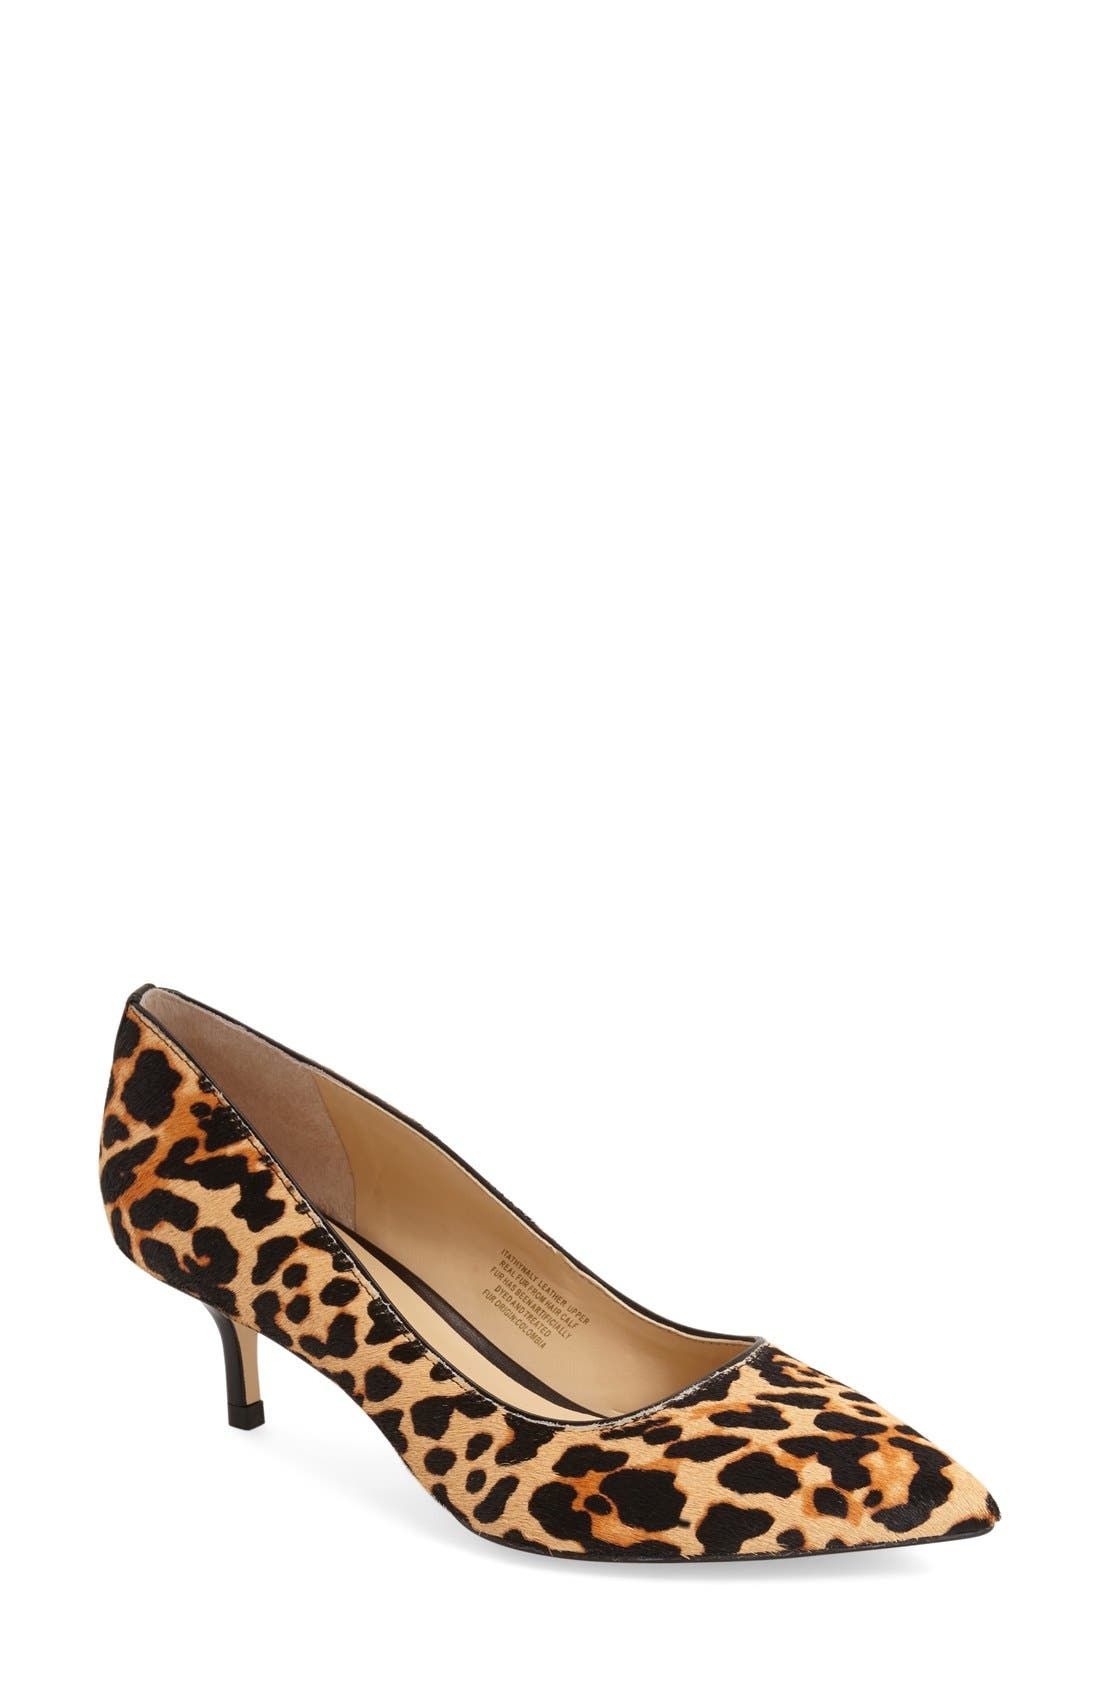 Main Image - Ivanka Trump 'Athynaly' Pointy Toe Genuine Calf Hair Pump (Women)